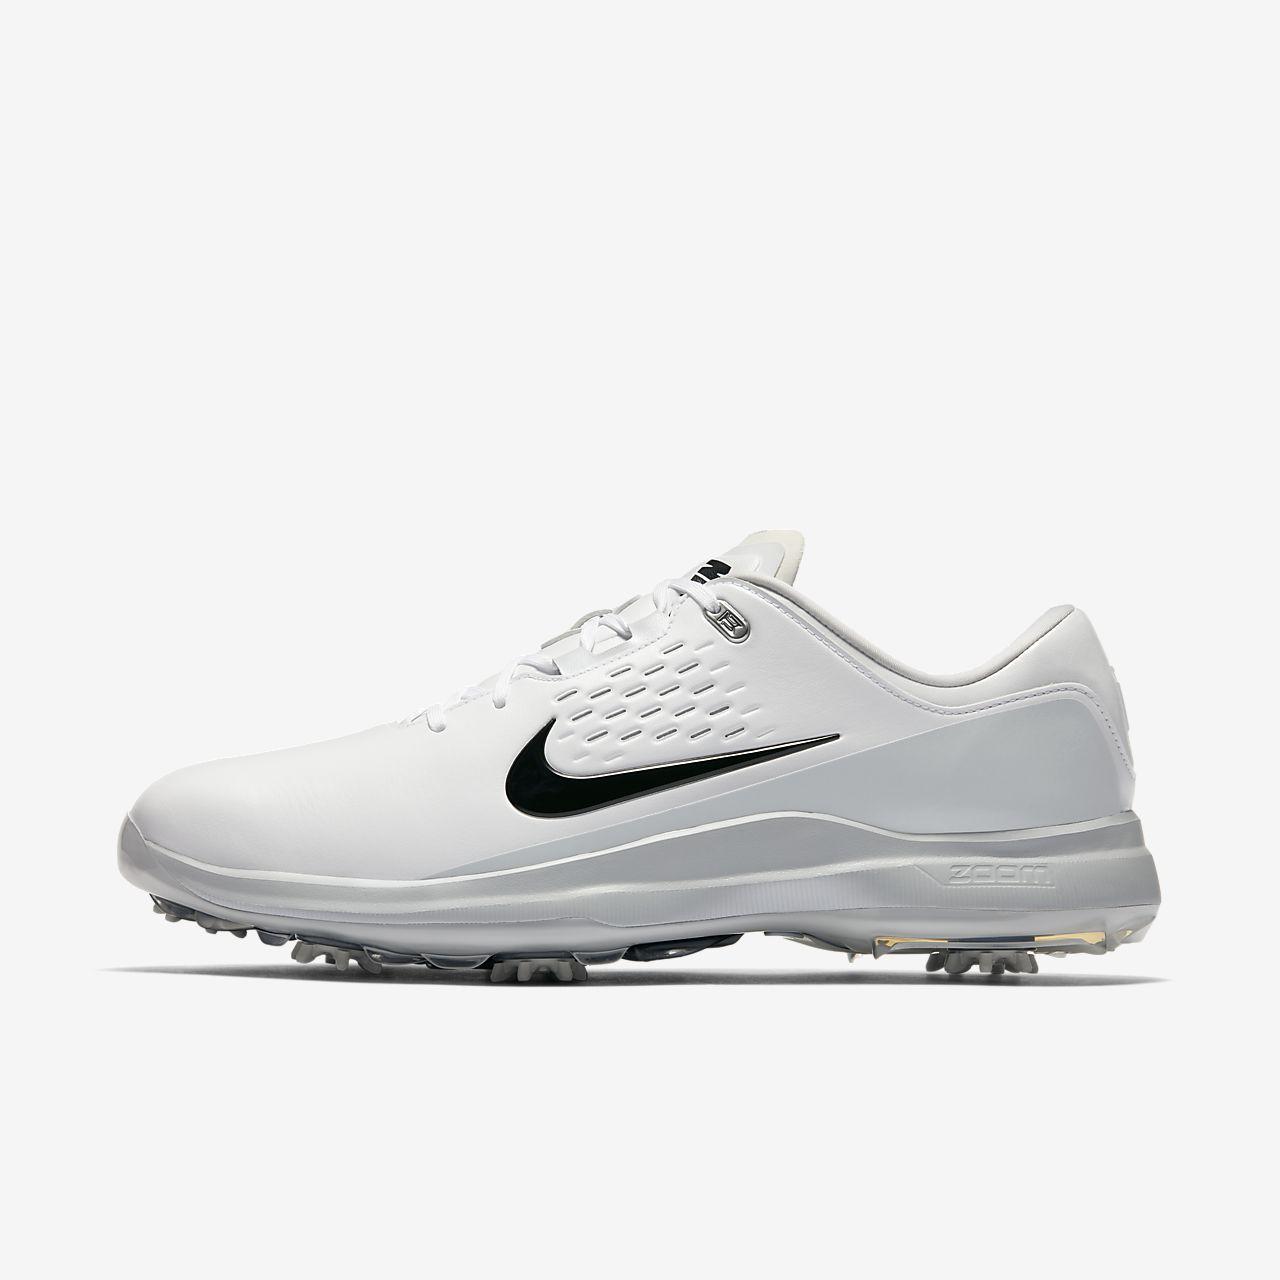 nike air nike mens golf shoes